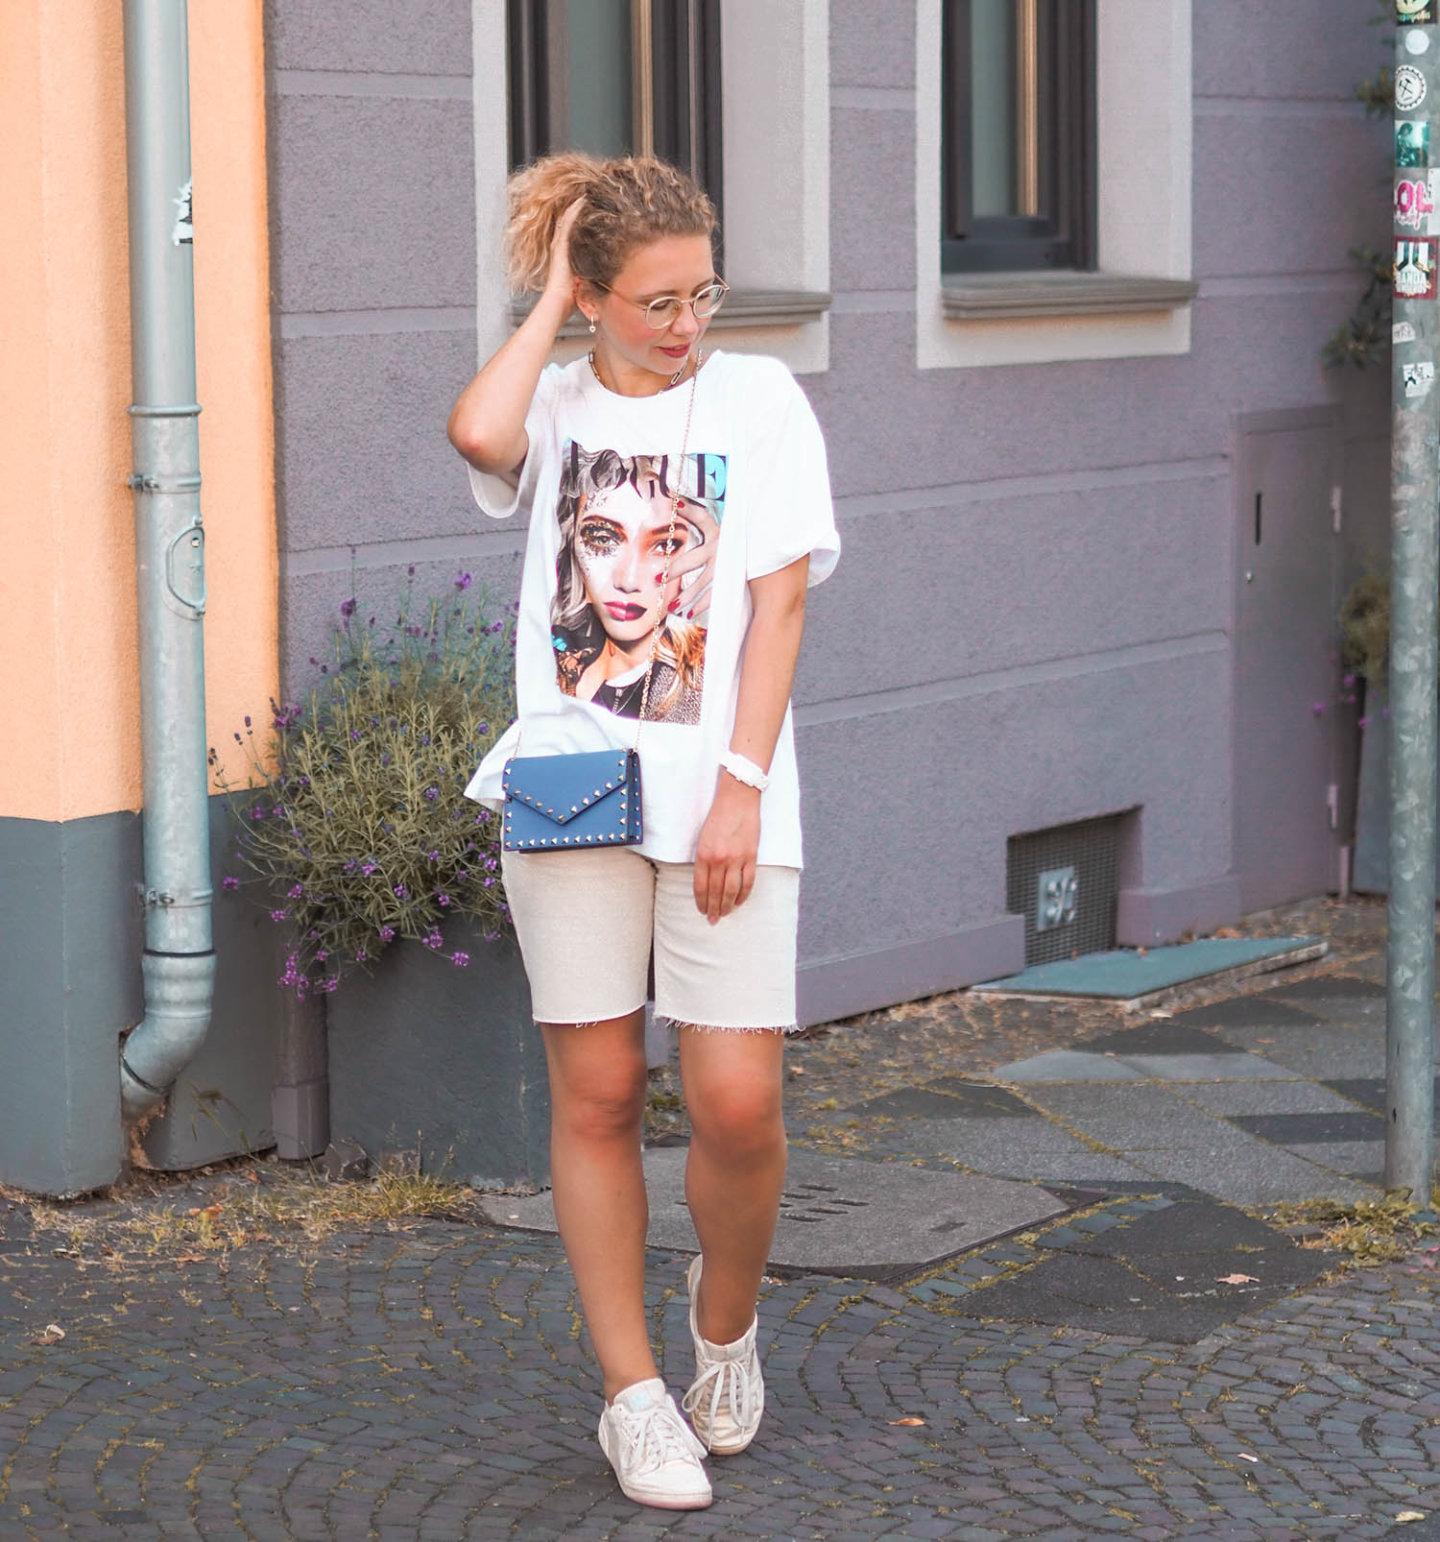 VOGUE T-Shirt Streetstyle von Fashionblogger Kationette